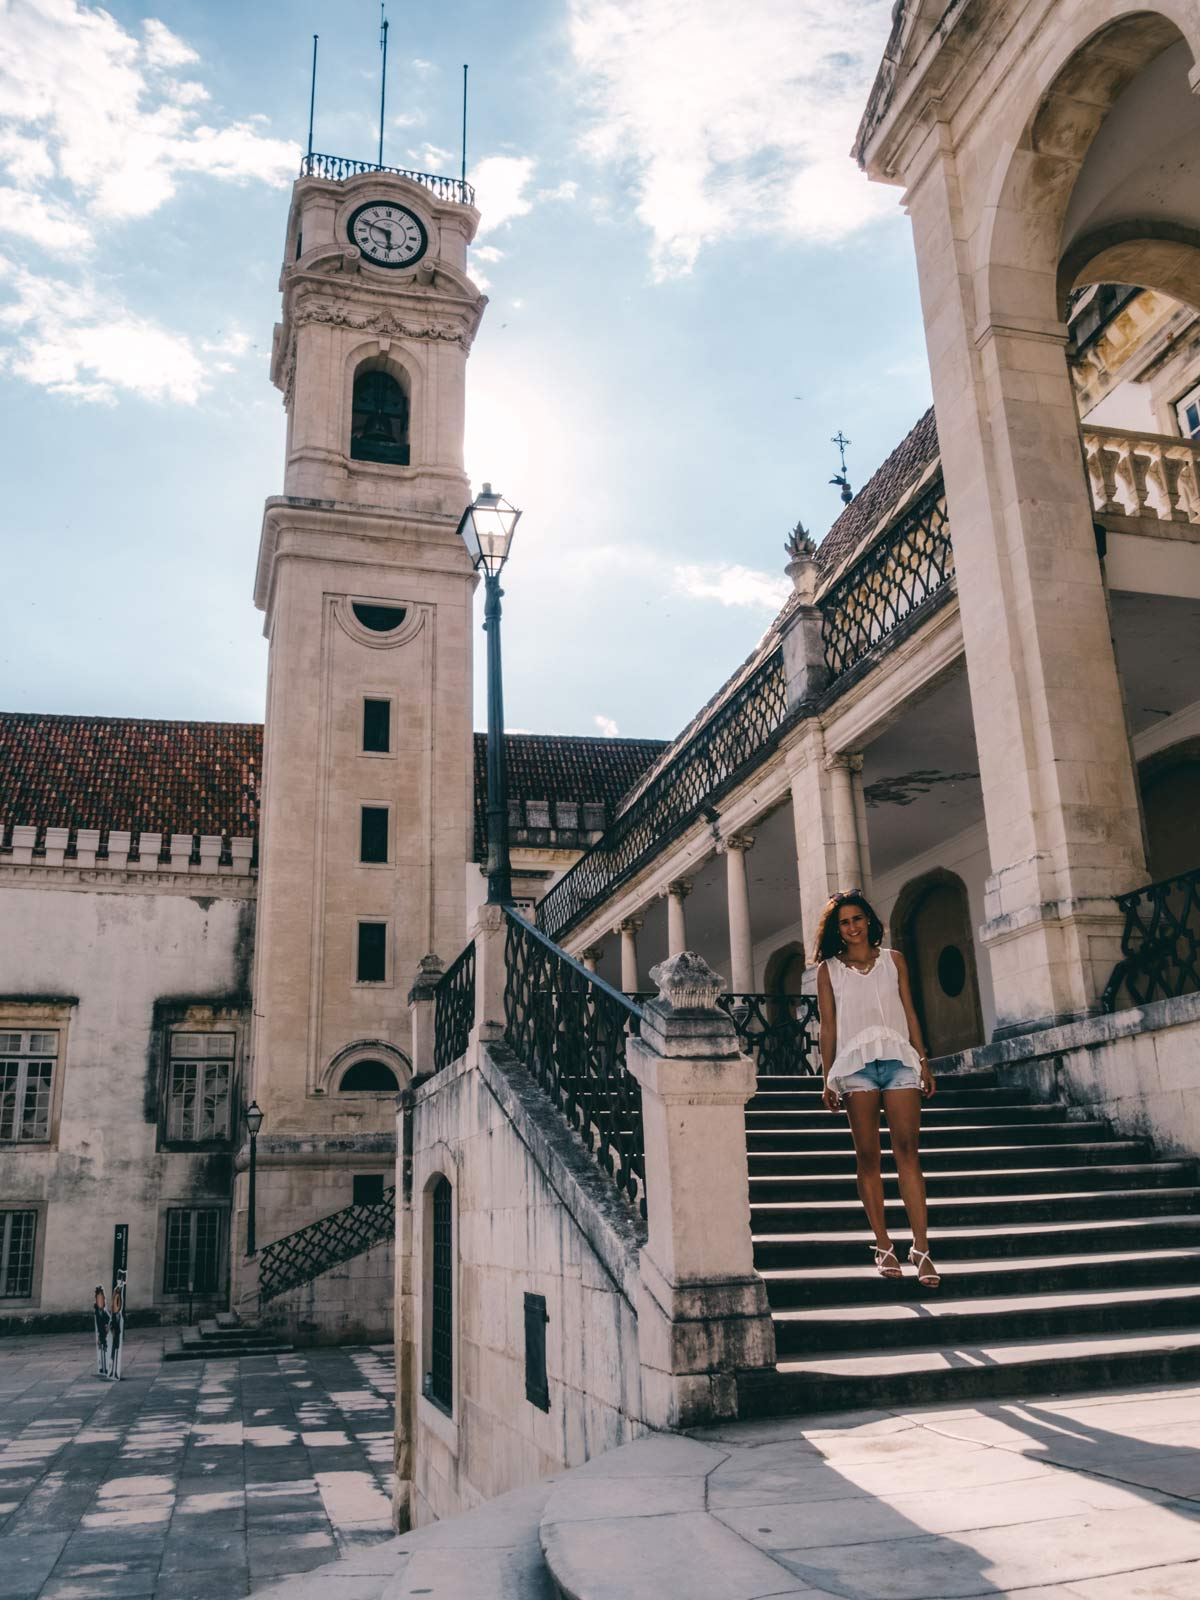 Uhrturm Coimbra